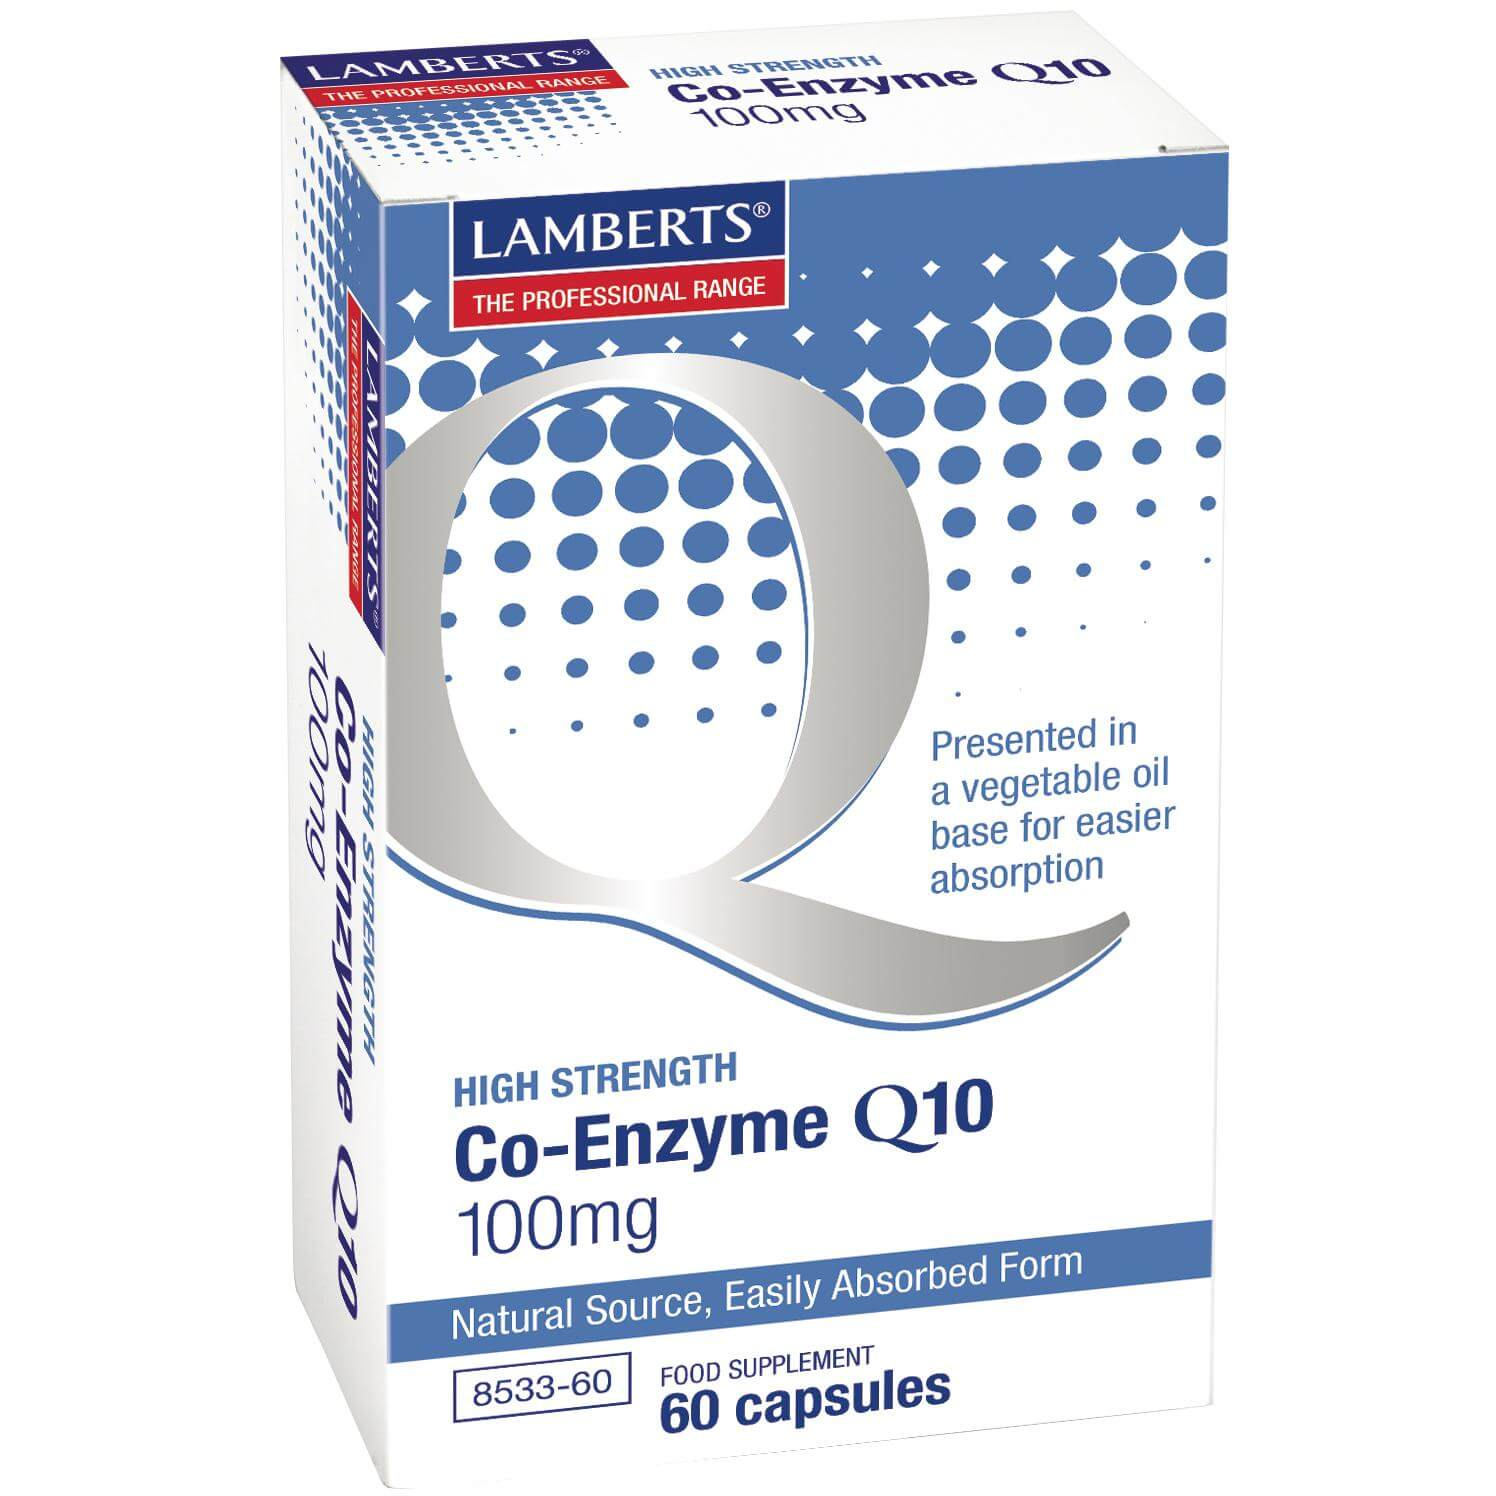 LambertsCo-Enzyme Q10 Συμπλήρωμα Διατροφής γιατην Παραγωγή Ενέργειας από τα Θρεπτικά Συστατικά της Τροφής 100mg – 60 tabs